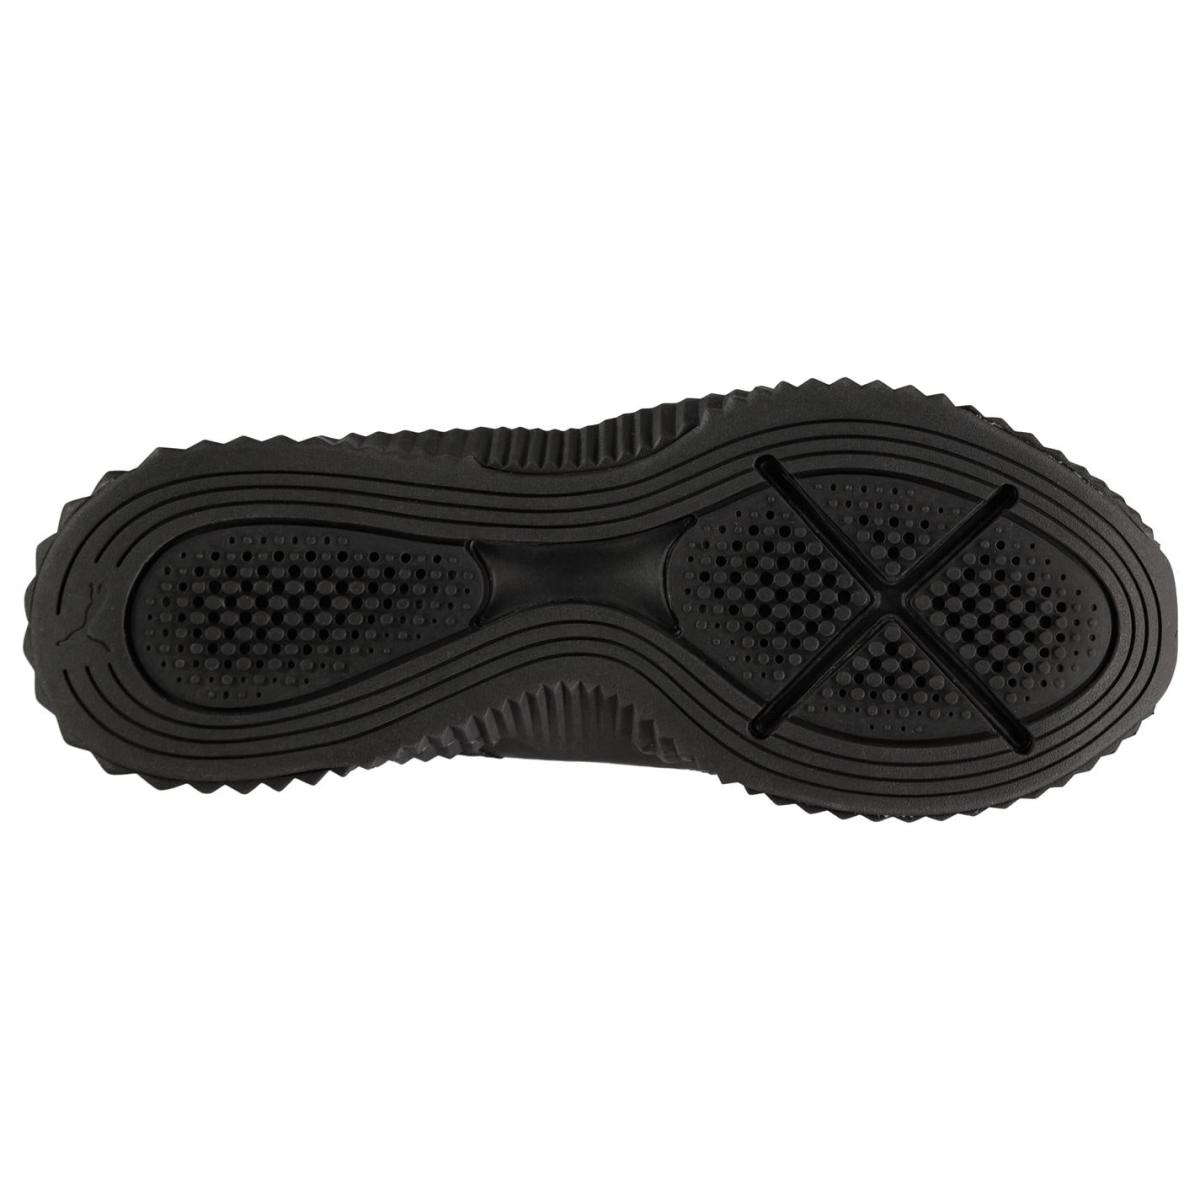 Puma-Defy-Turnschuhe-Damen-Sneaker-Sportschuhe-Laufschuhe-9005 Indexbild 6